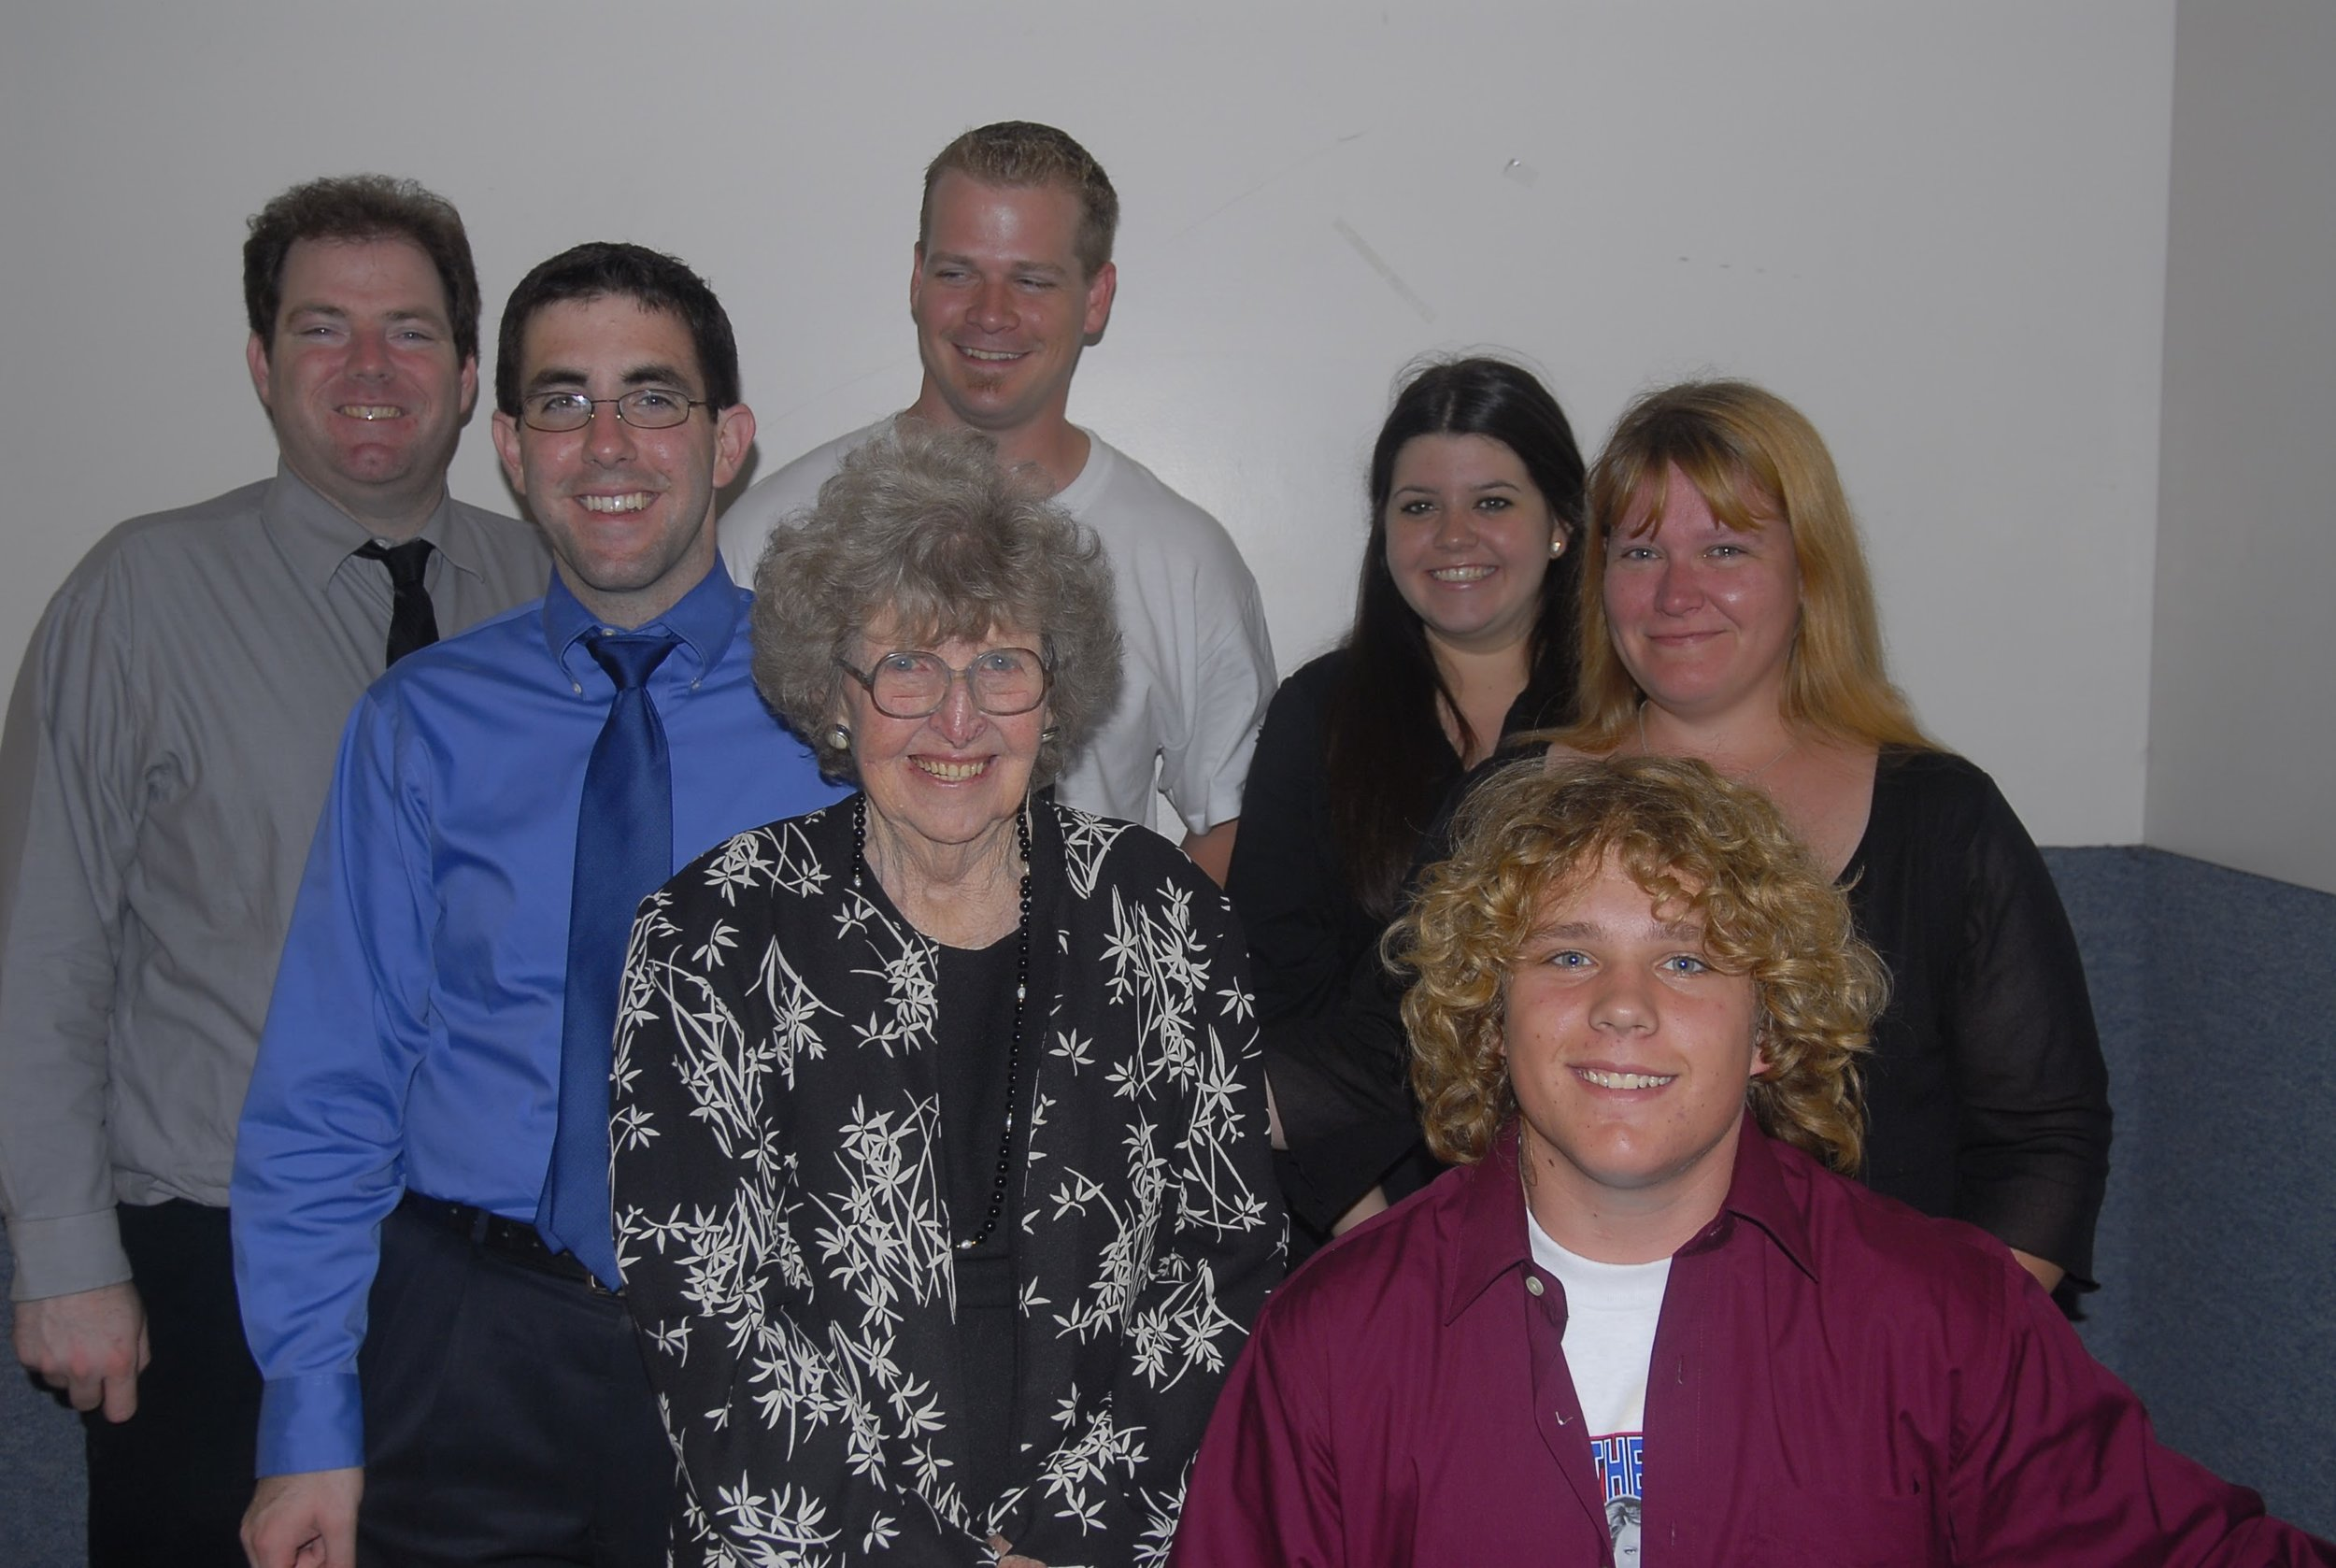 Mom with 6 of her 7 grandchildren.  Jason, Matt, Duane, Jennifer, Jeremy and Bonnie.